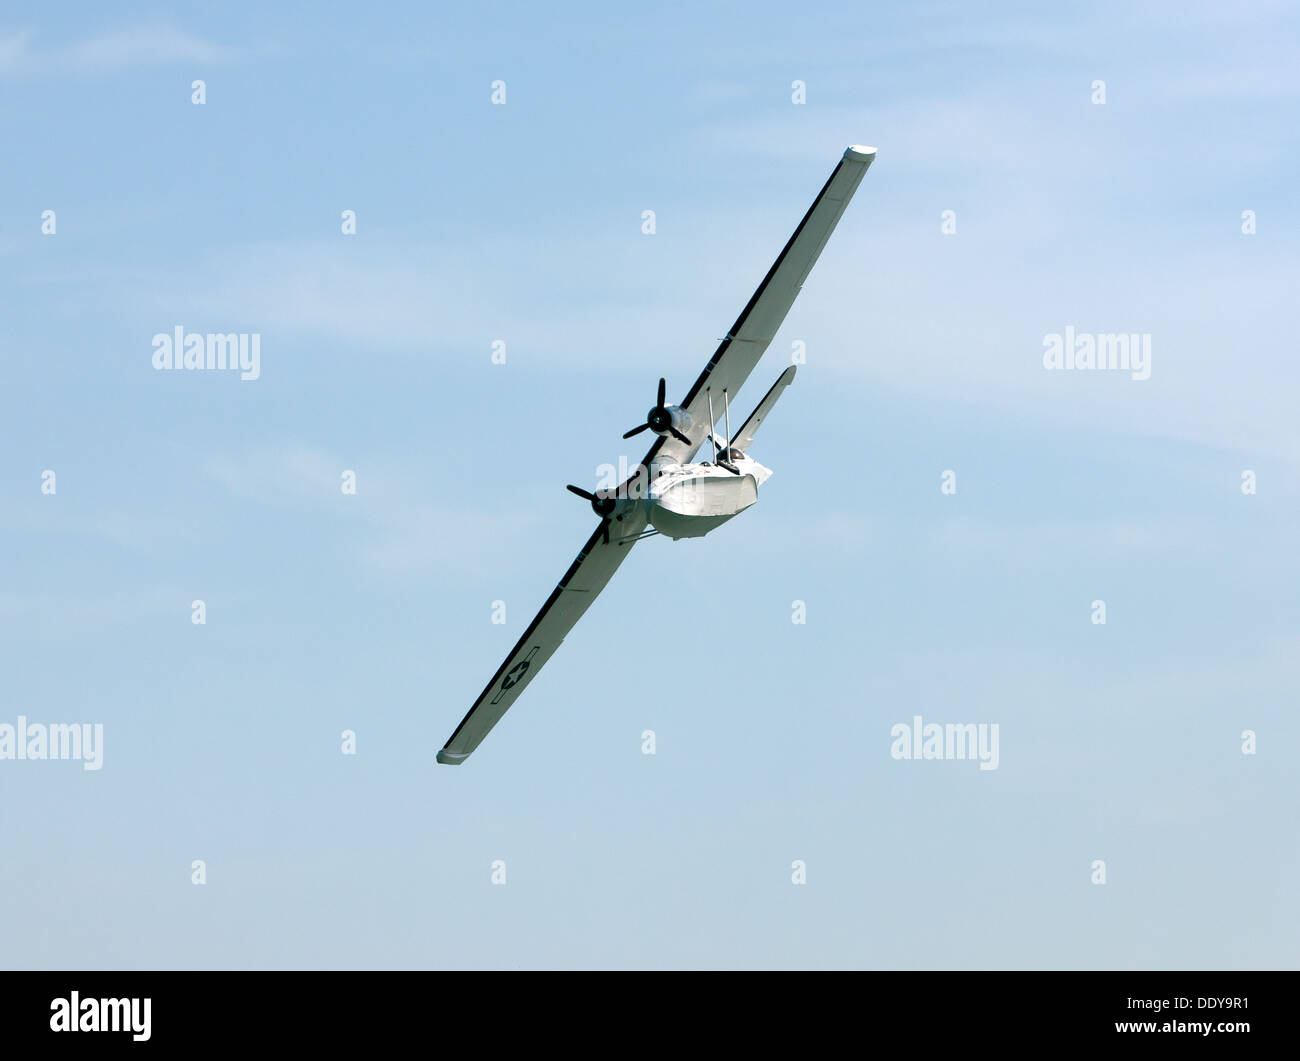 PBY Catalina G-PBYA 433915 displaying at the Broadstairs Water Gala, 2013. - Stock Image